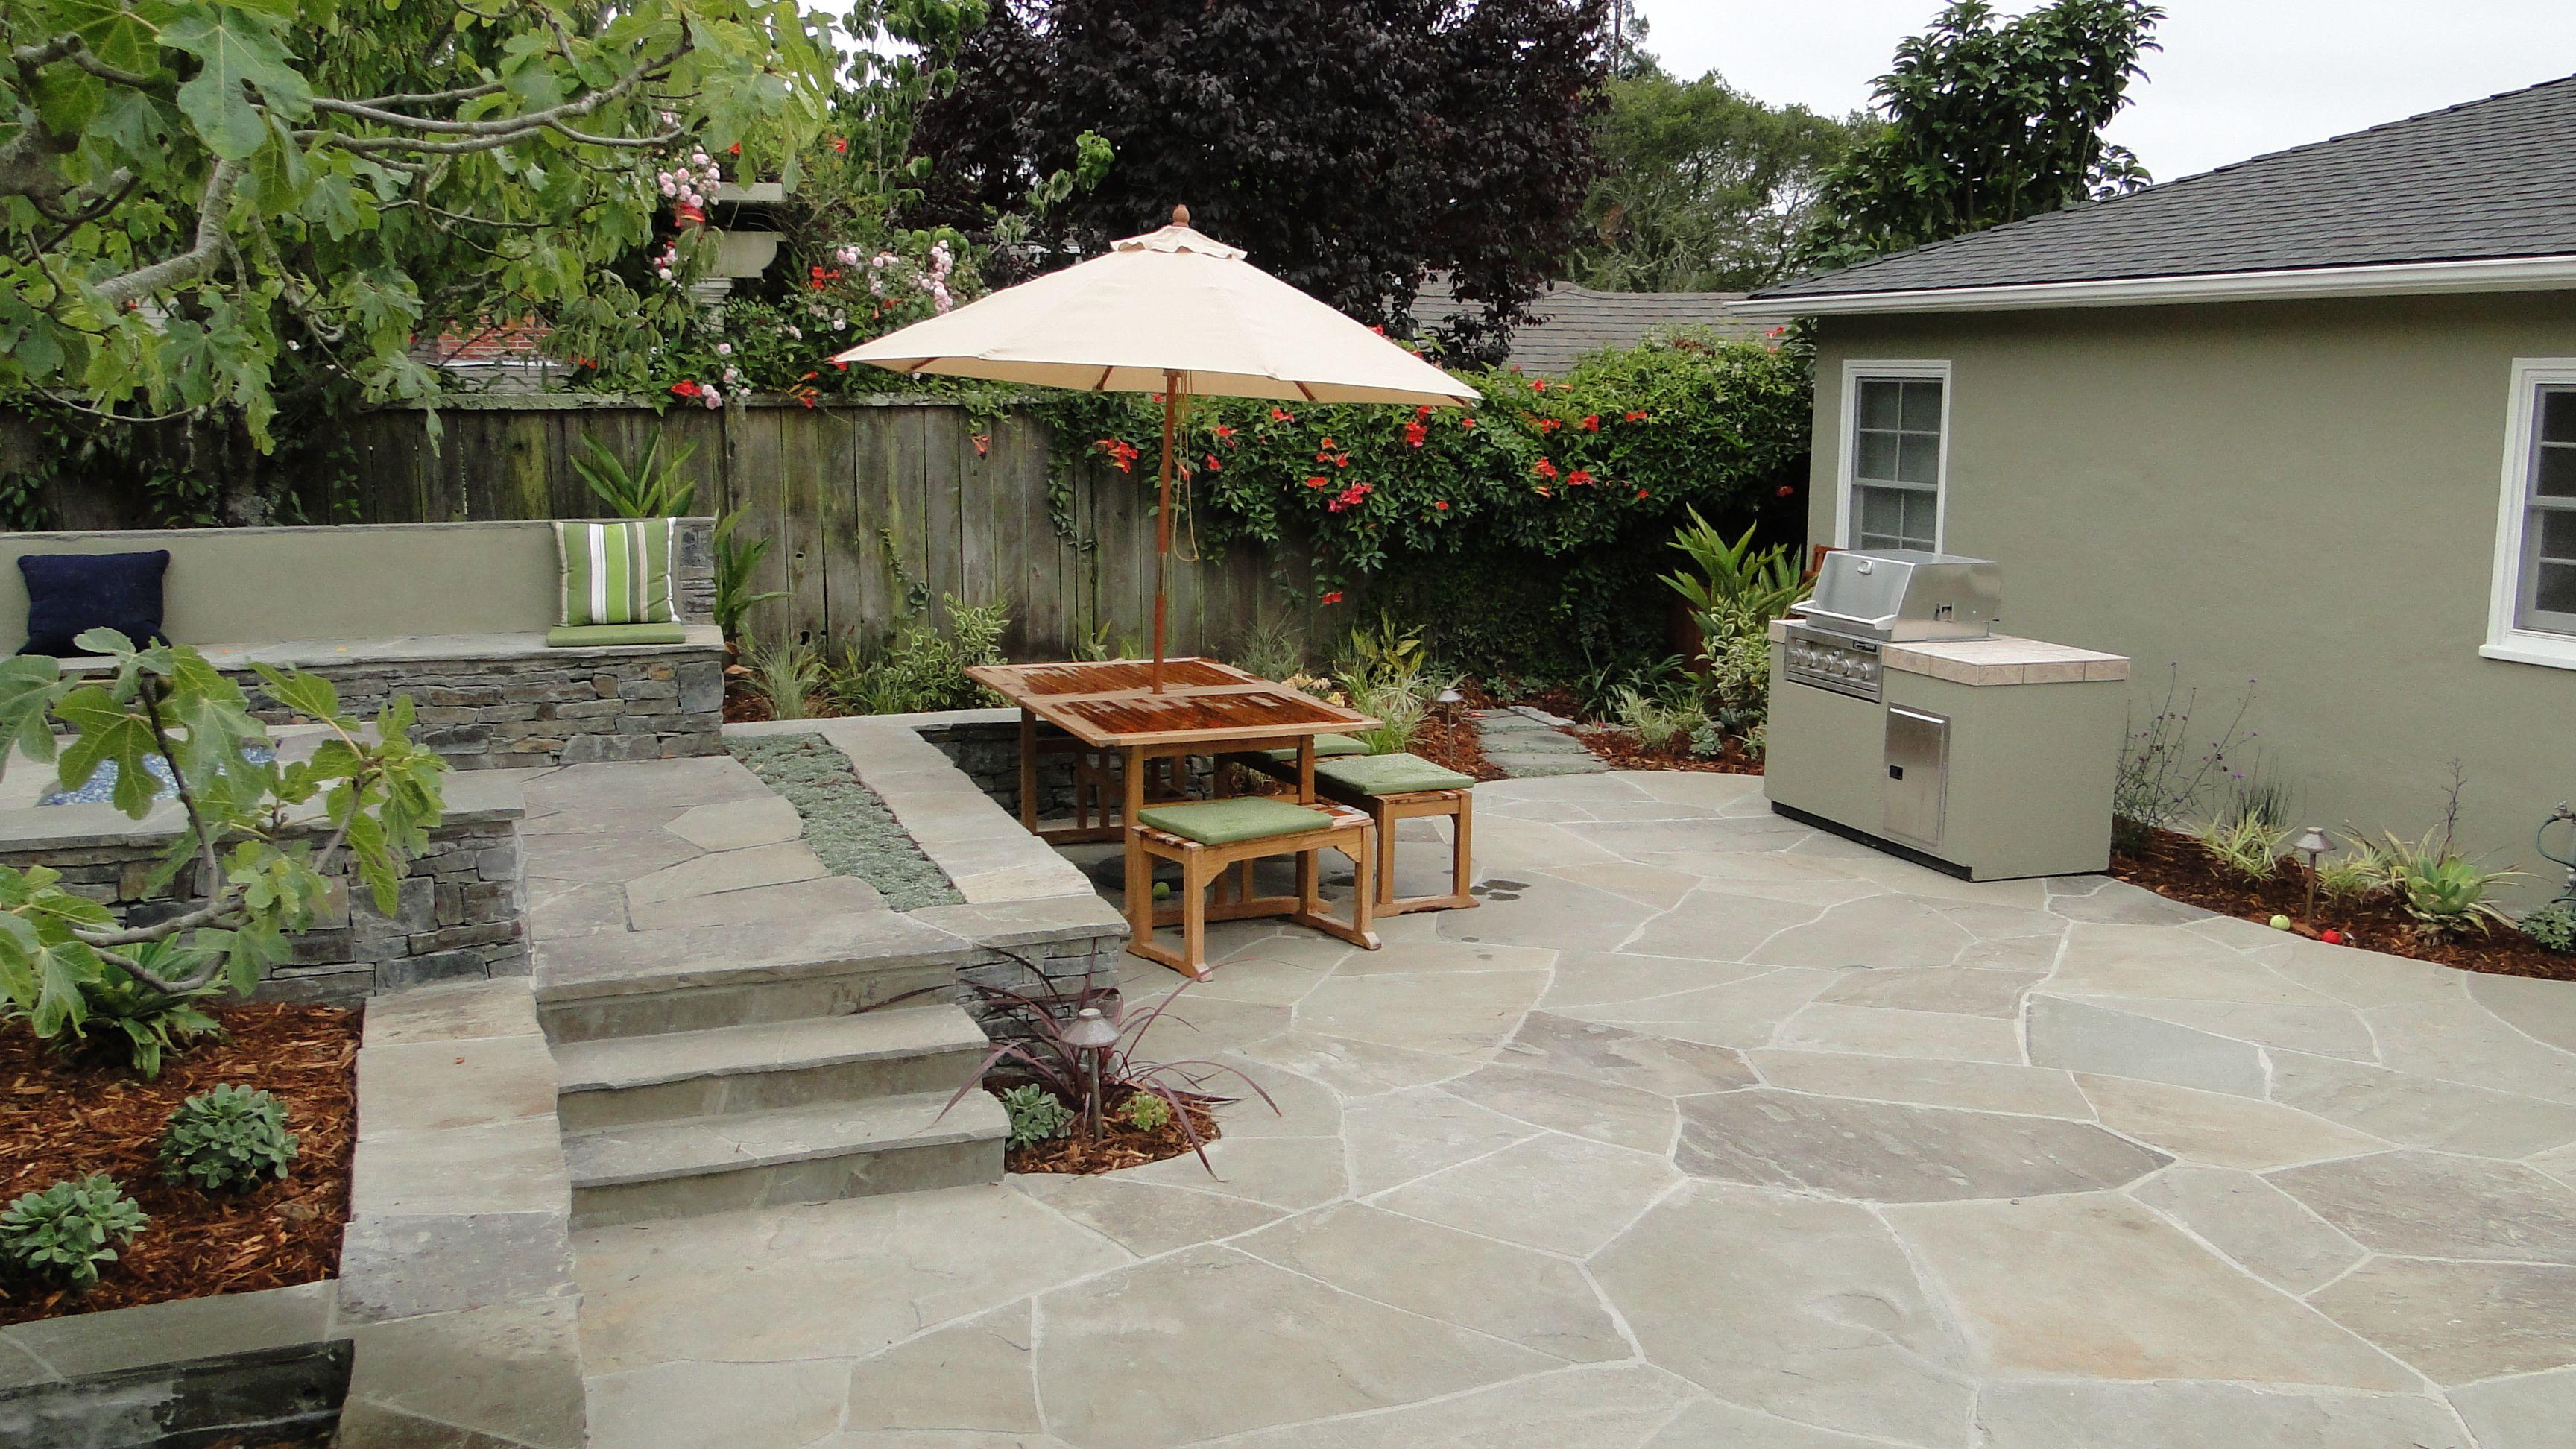 green stucco garden wall - Google Search | Garden wall ... on Green Wall Patio id=43391